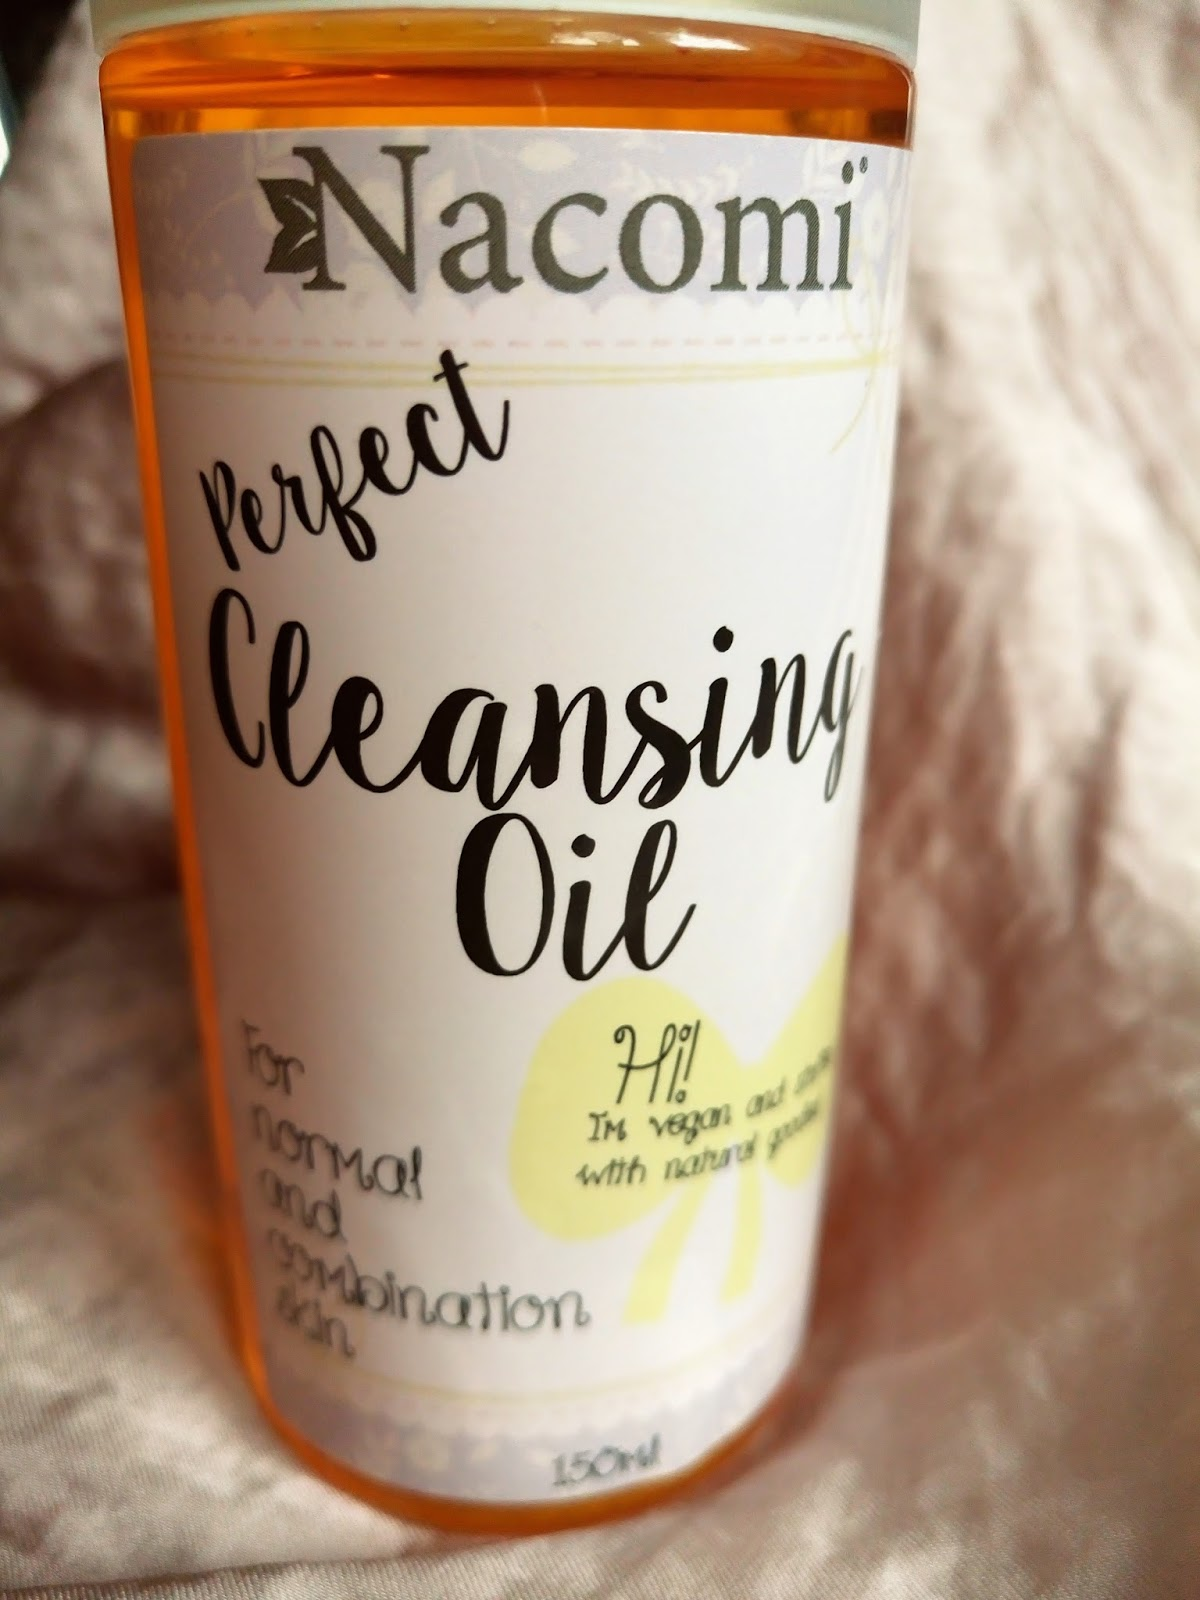 Nacomi Cleansing Oil, olejek do usuwania makijażu